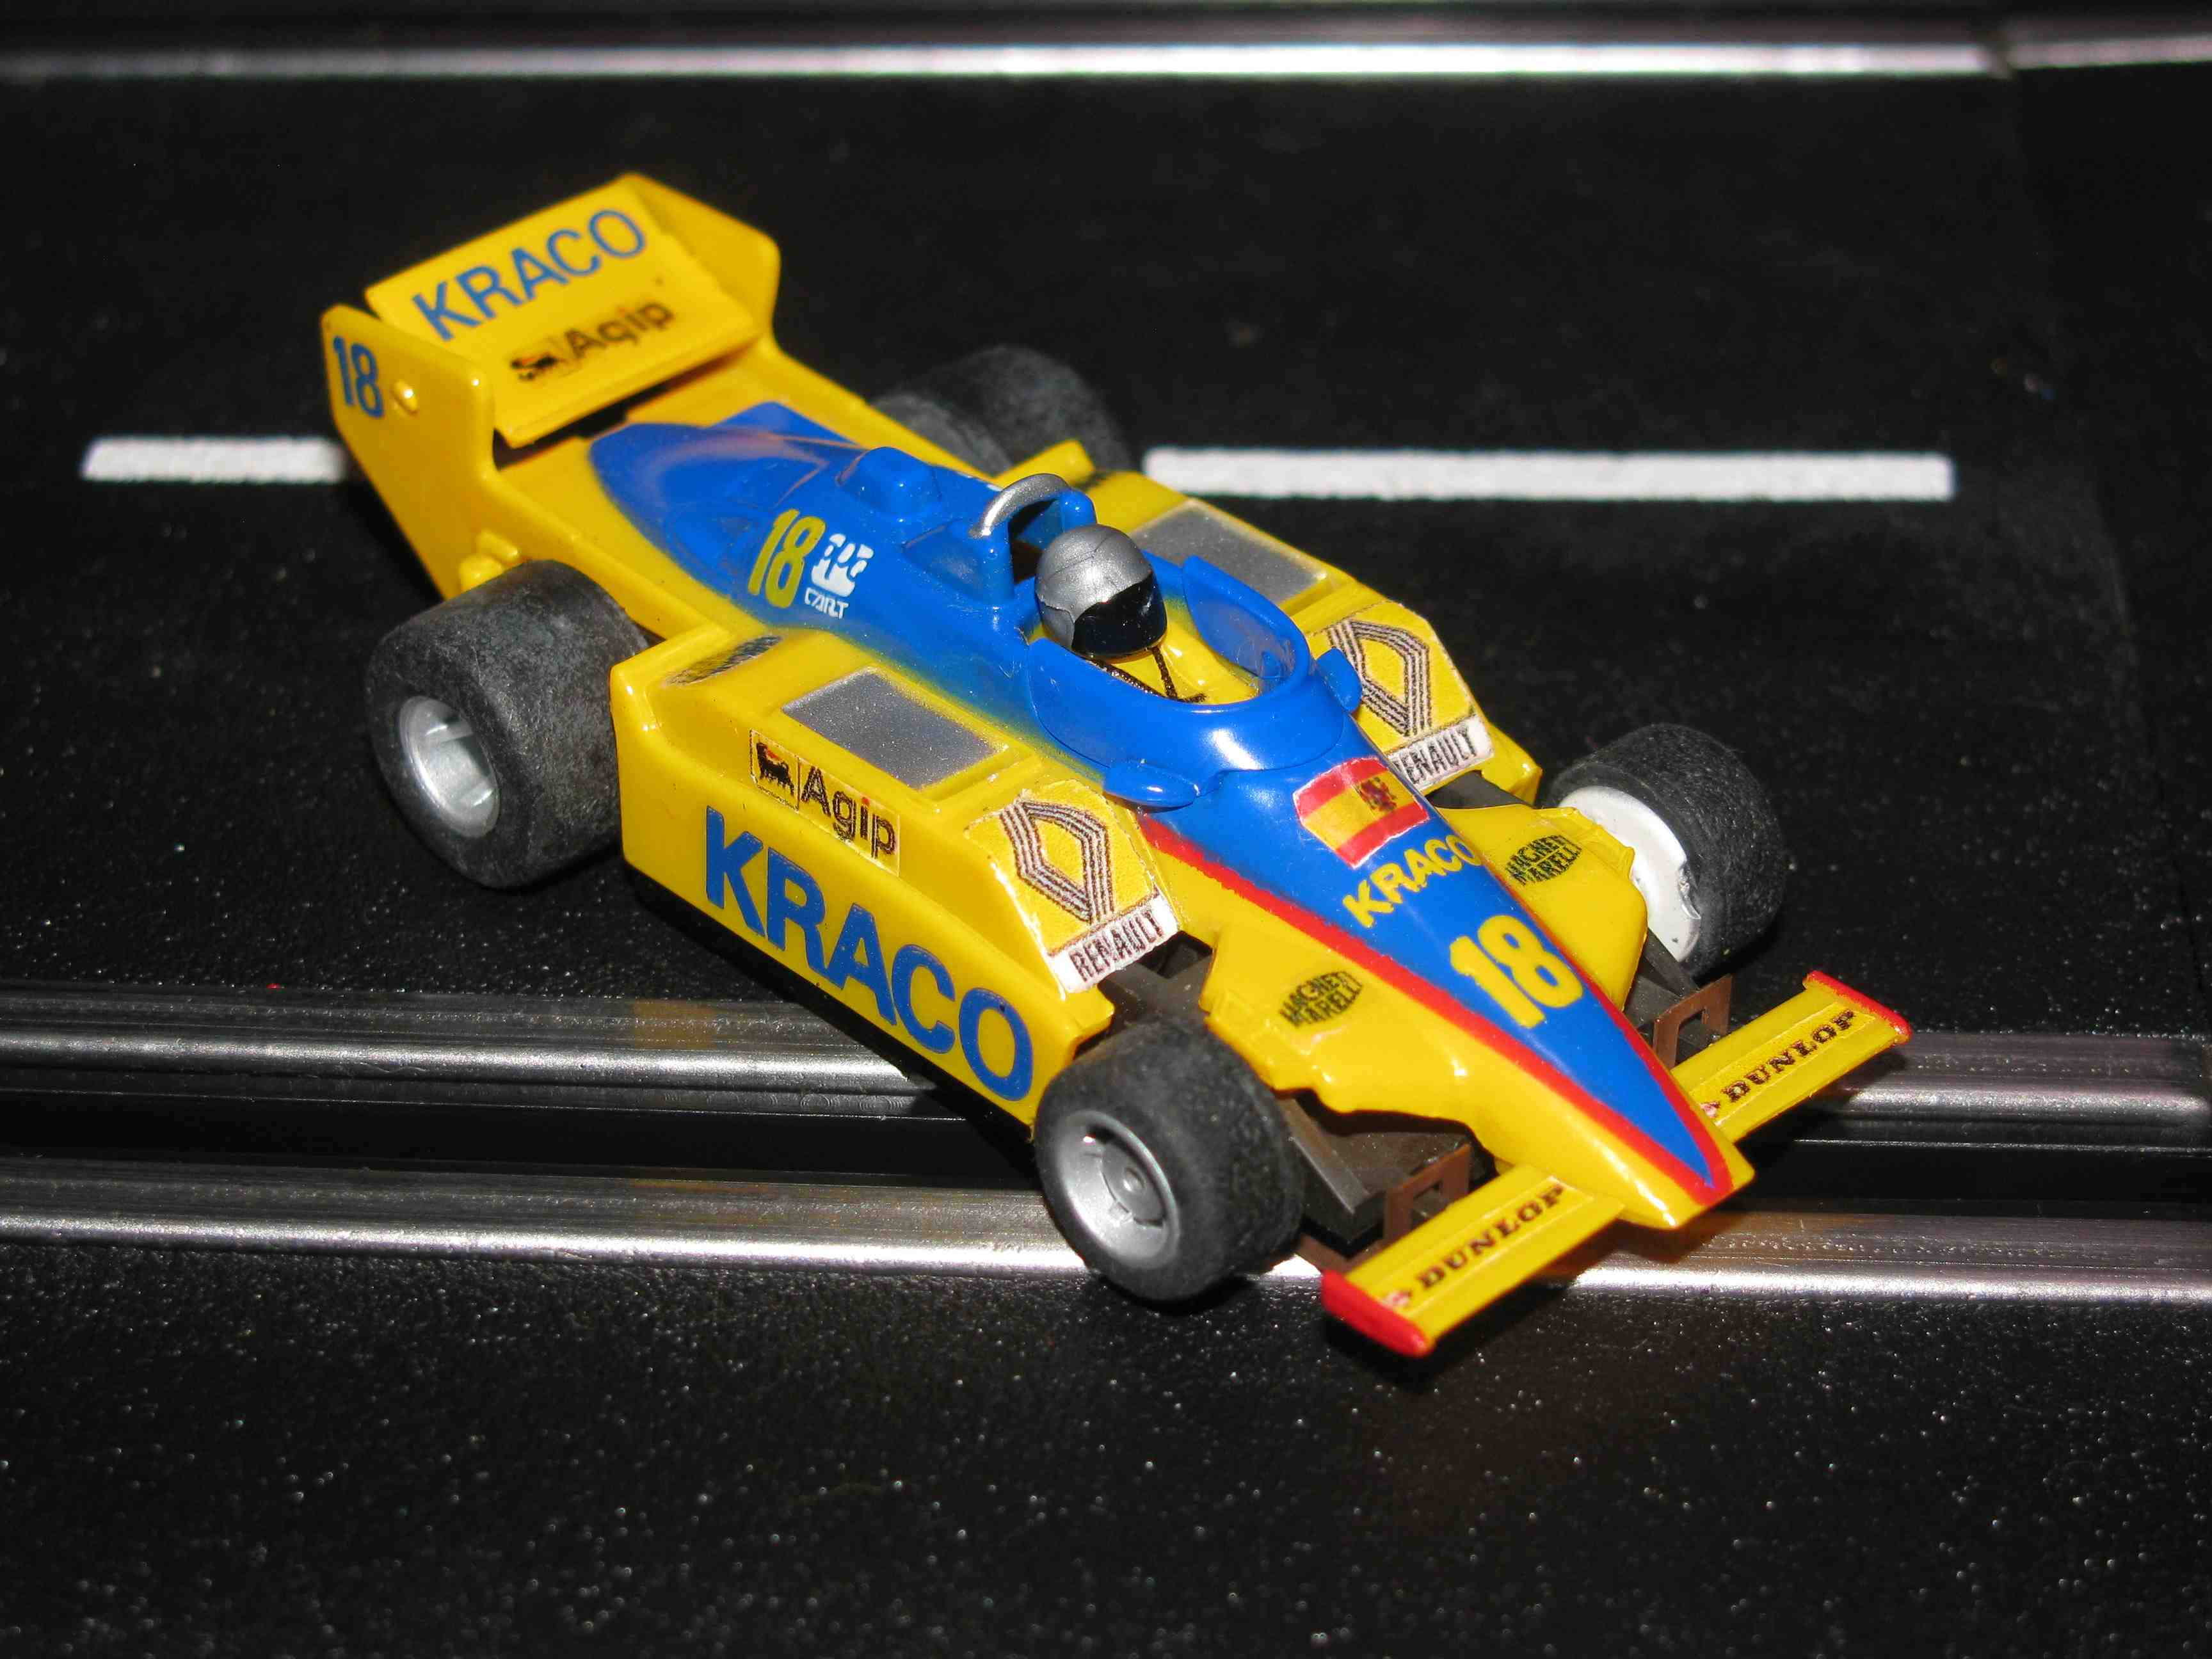 * SOLD * TYCO Renault - KRACO – Formula 1 - HO Slot Car - Car#18 – W/Guide Post